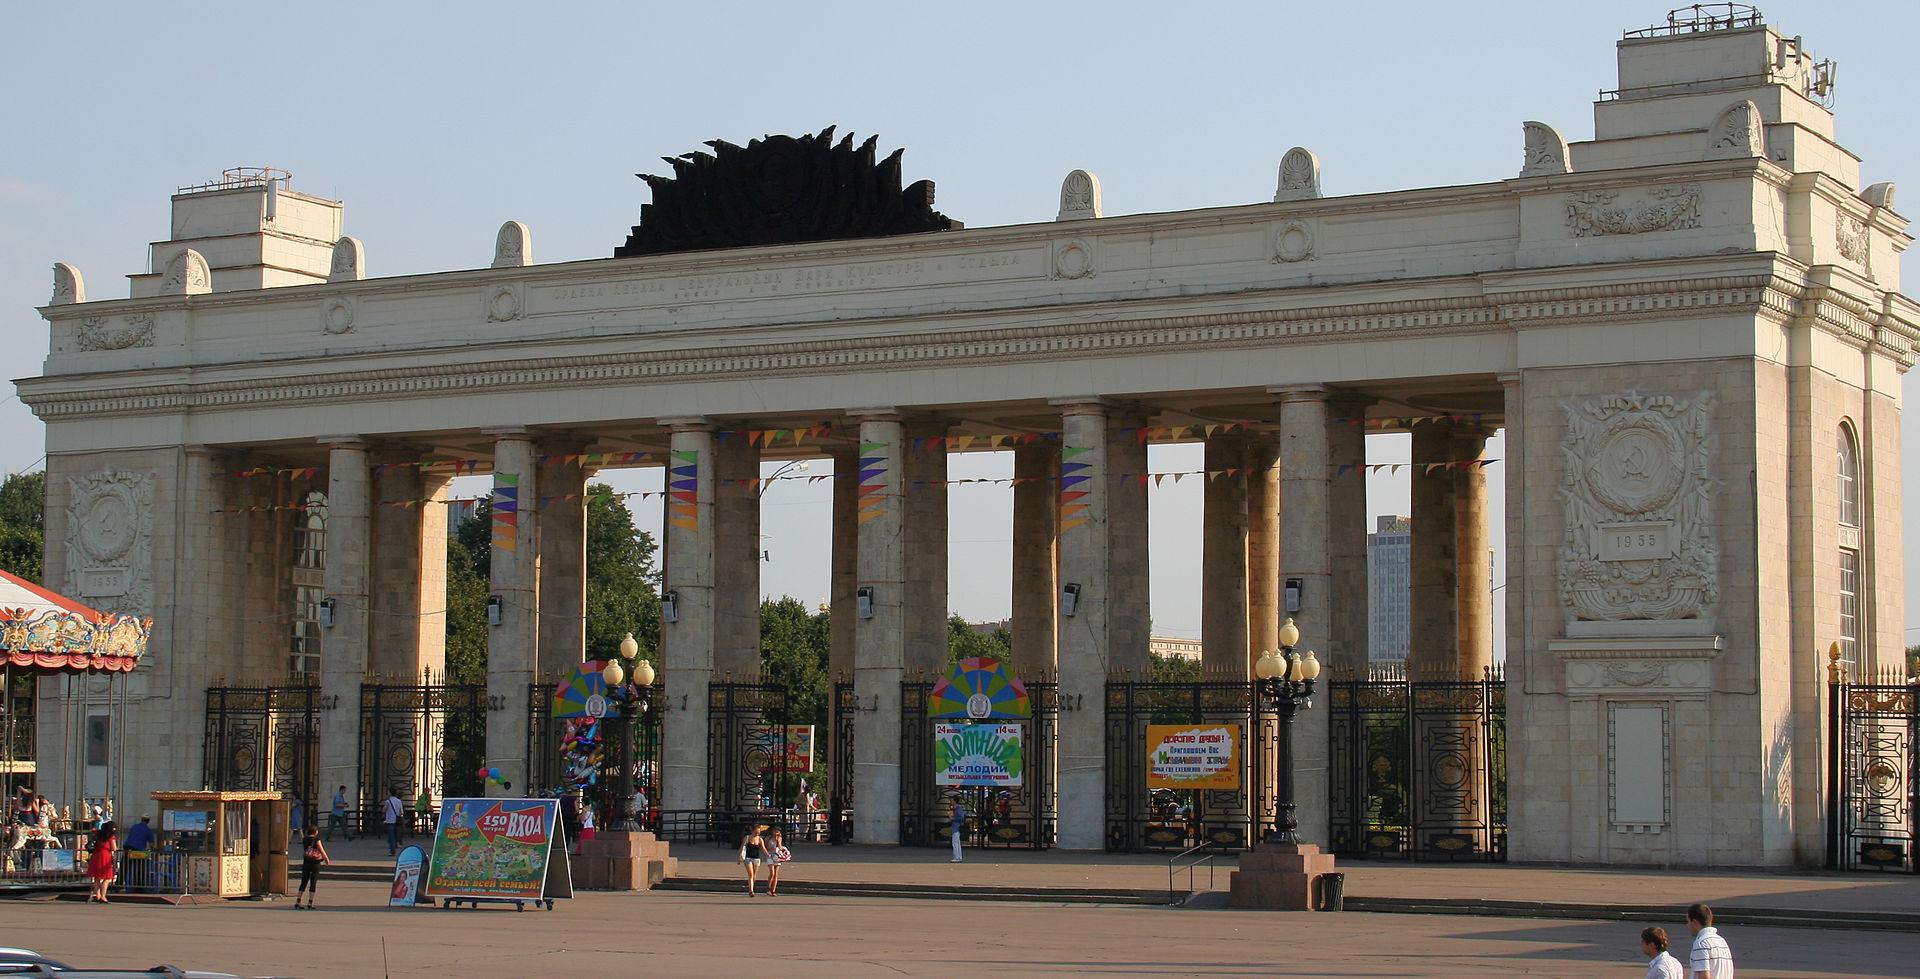 55Moscow_Gorky_Park_entrance.jpg